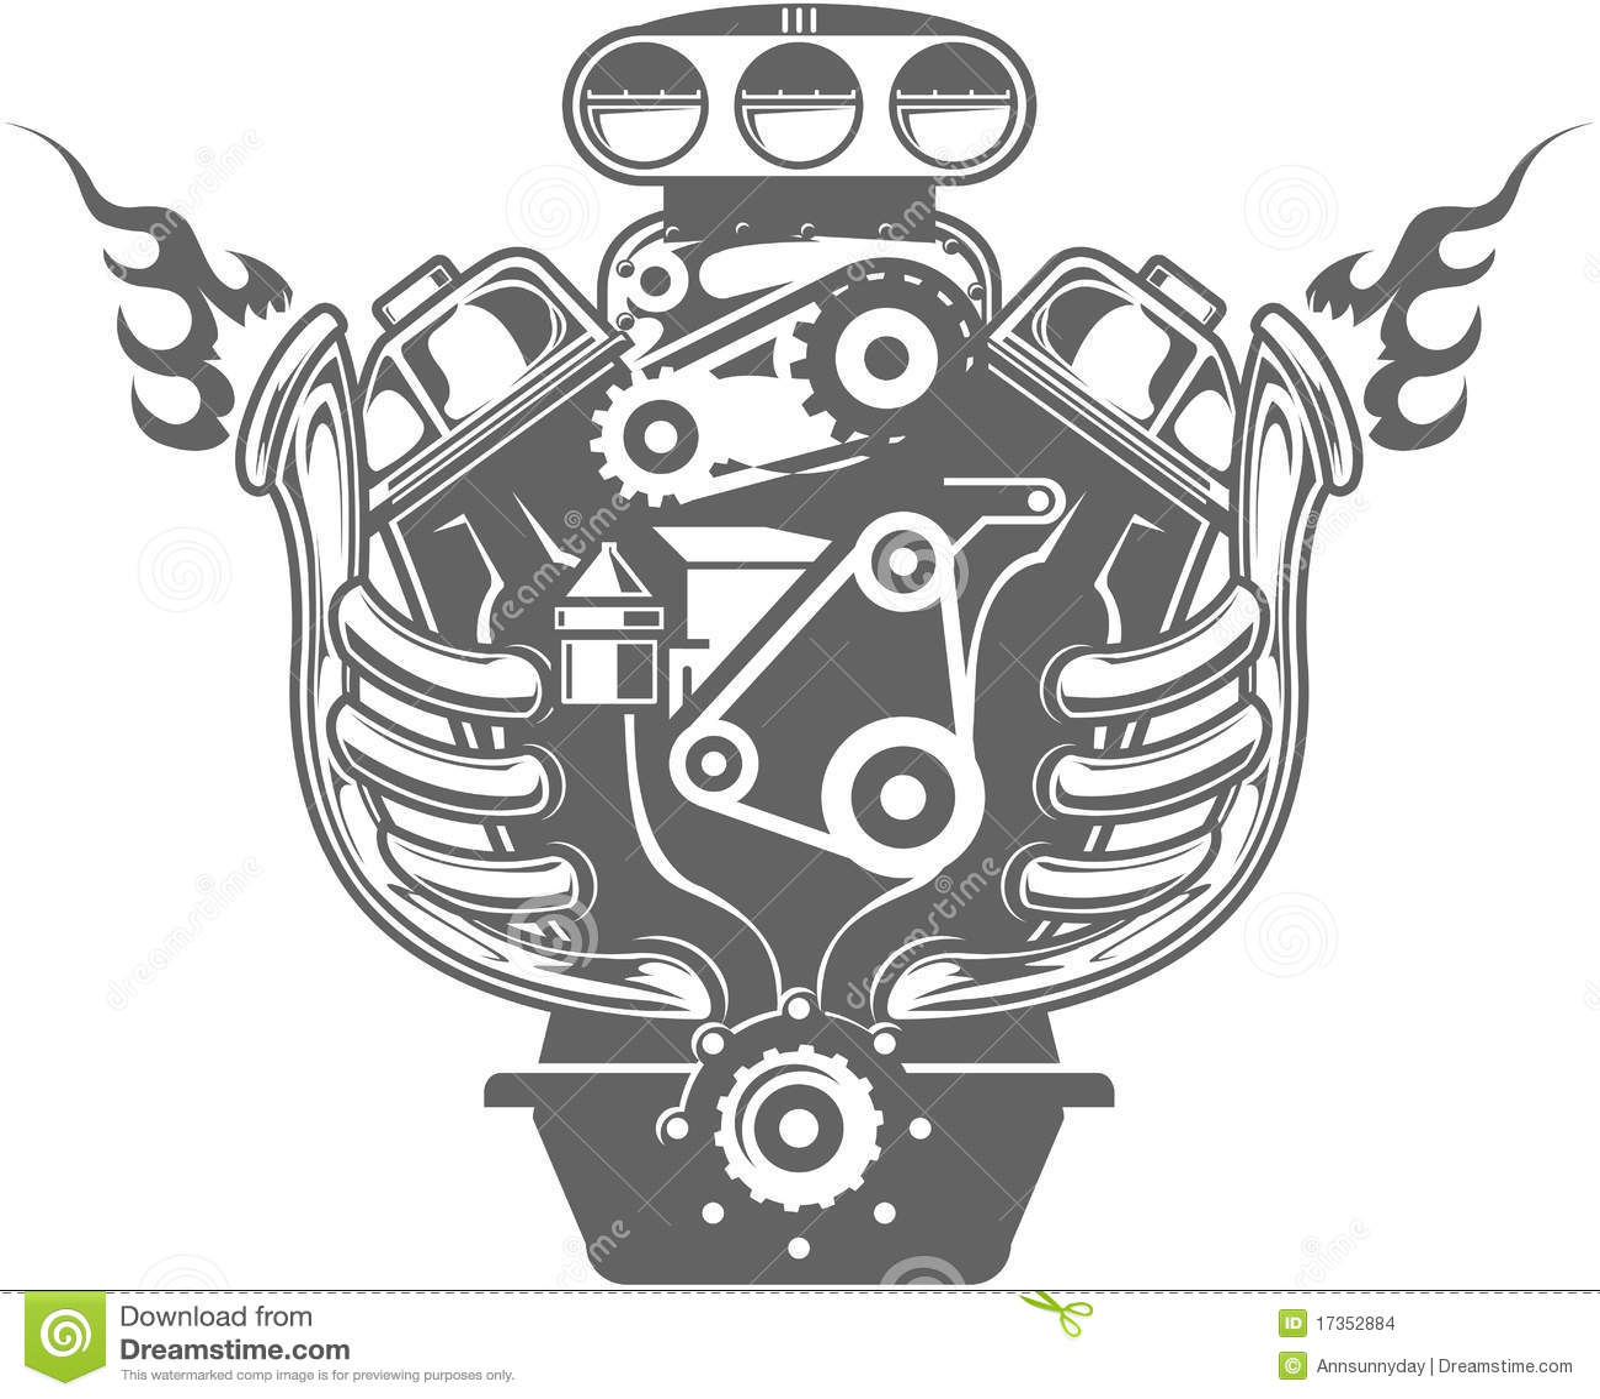 racing engine stock vector illustration of exhaust. Black Bedroom Furniture Sets. Home Design Ideas